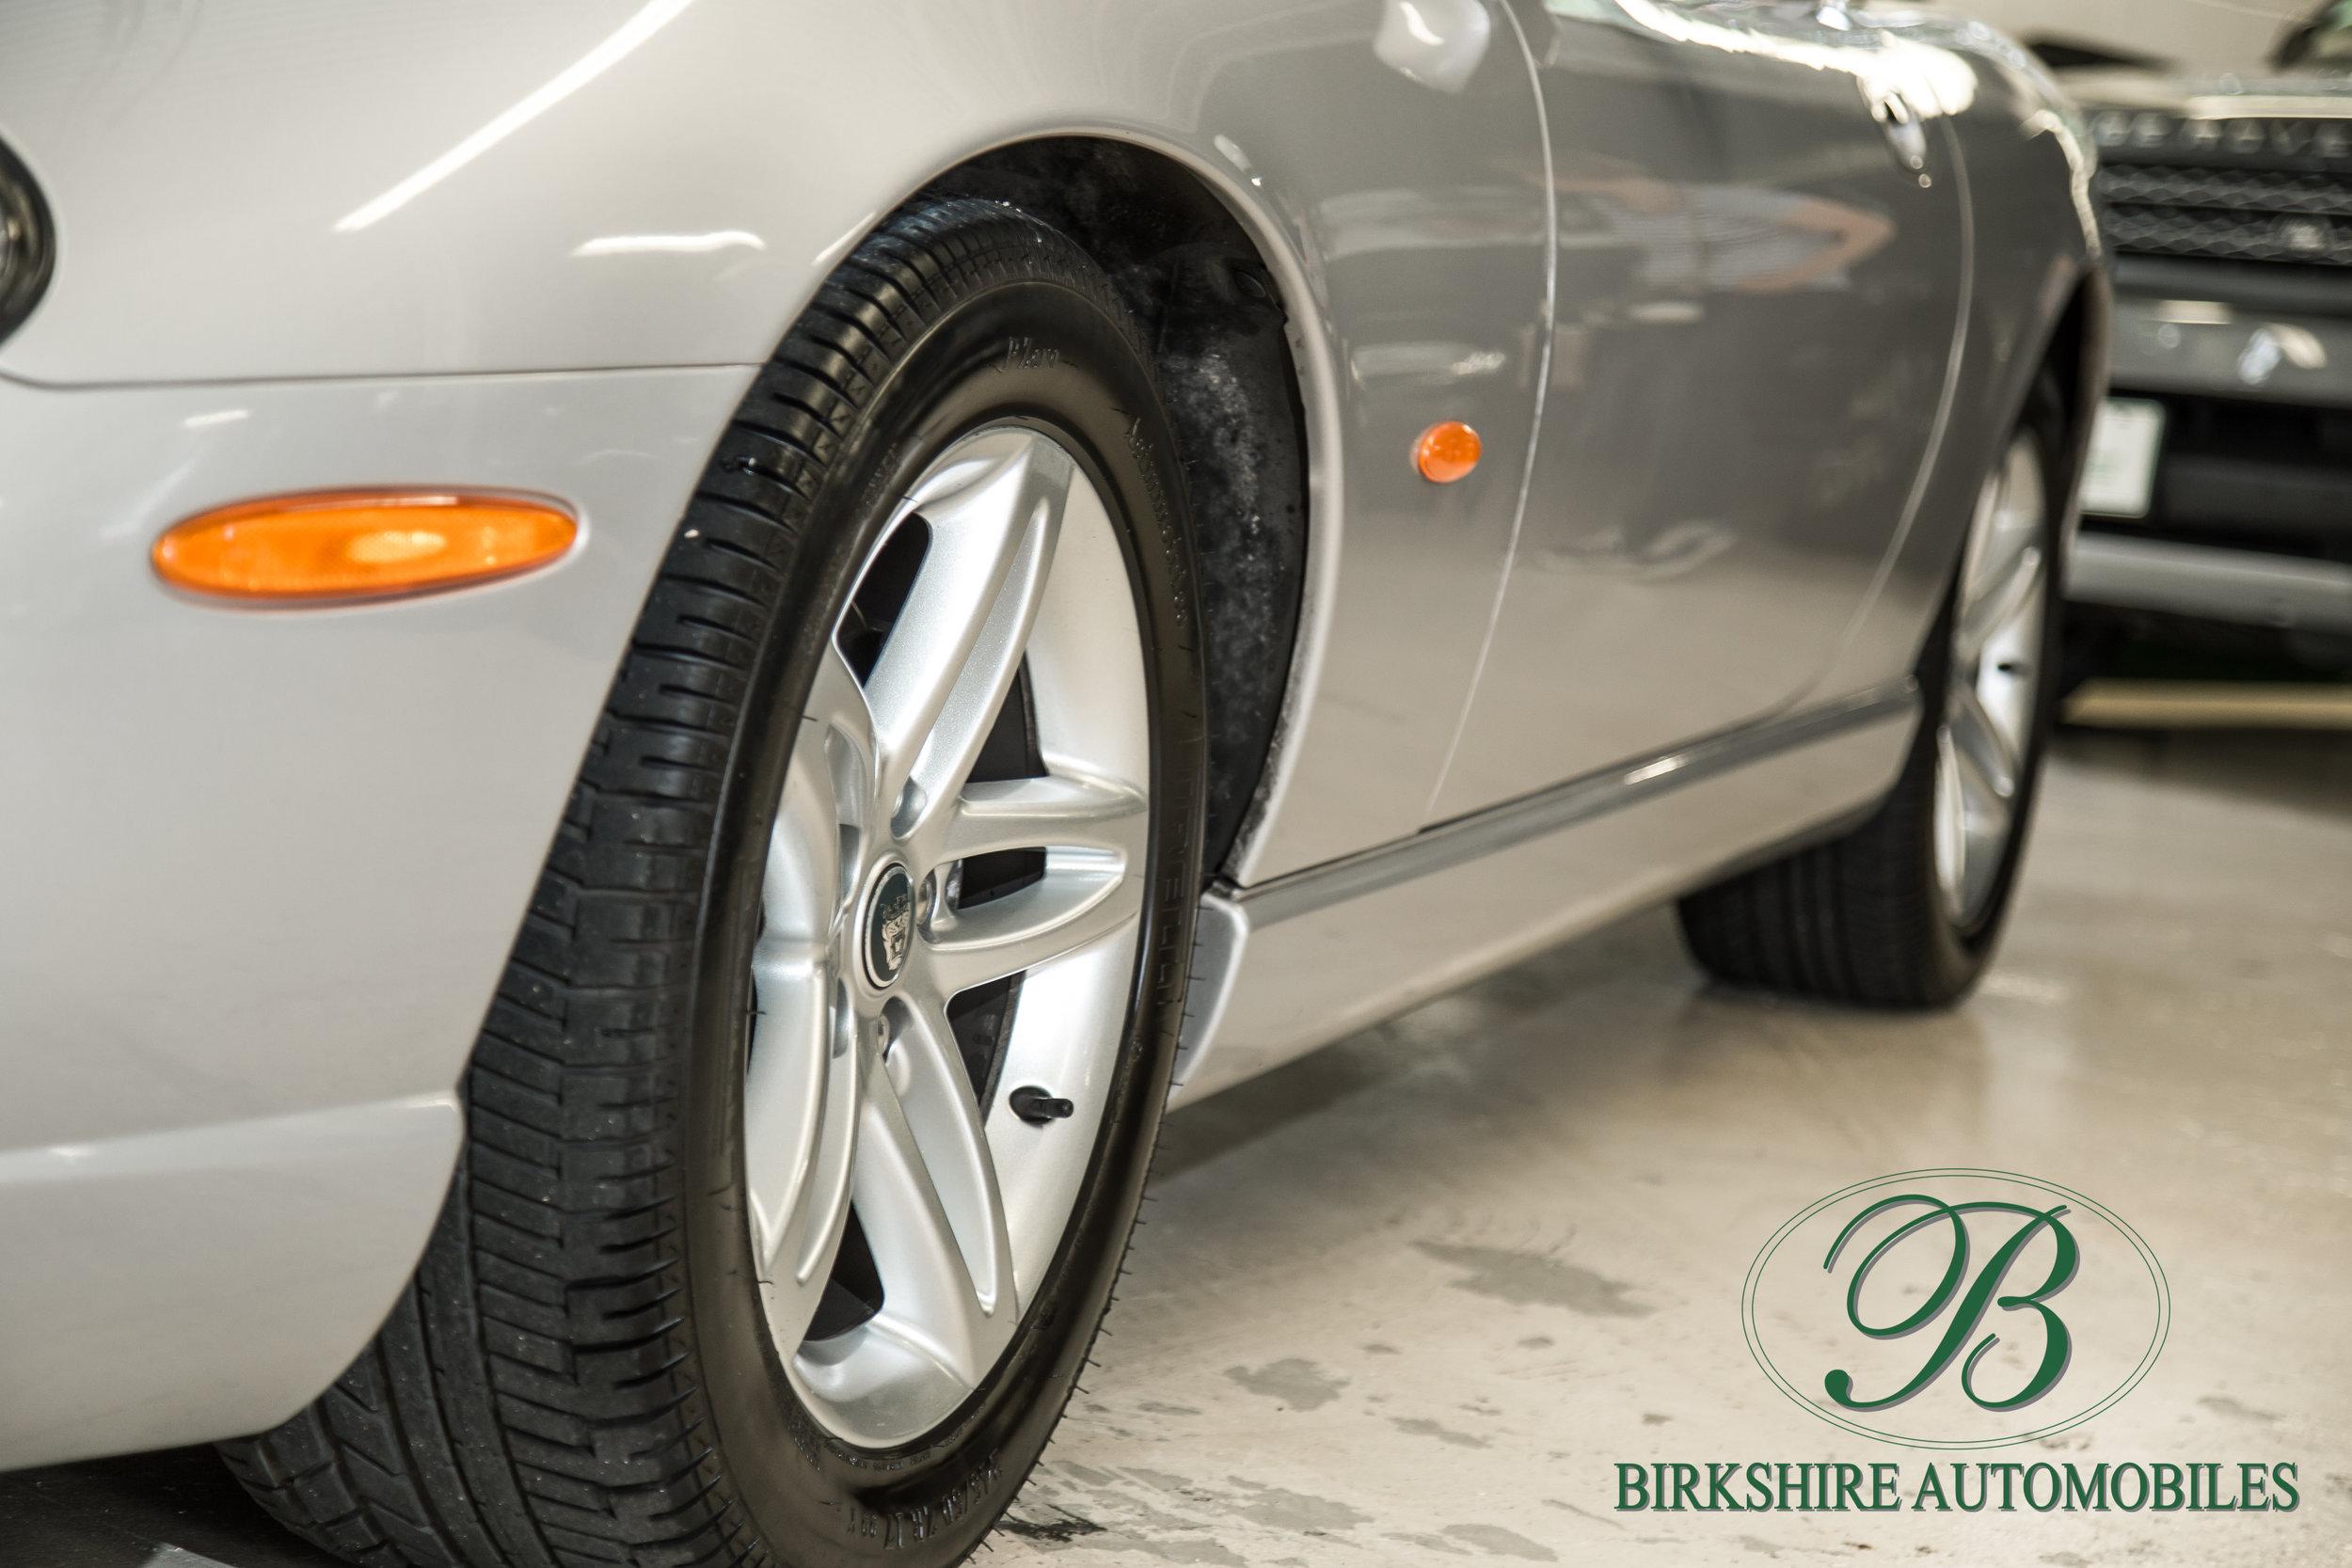 Birkshire Automobiles-250.jpg